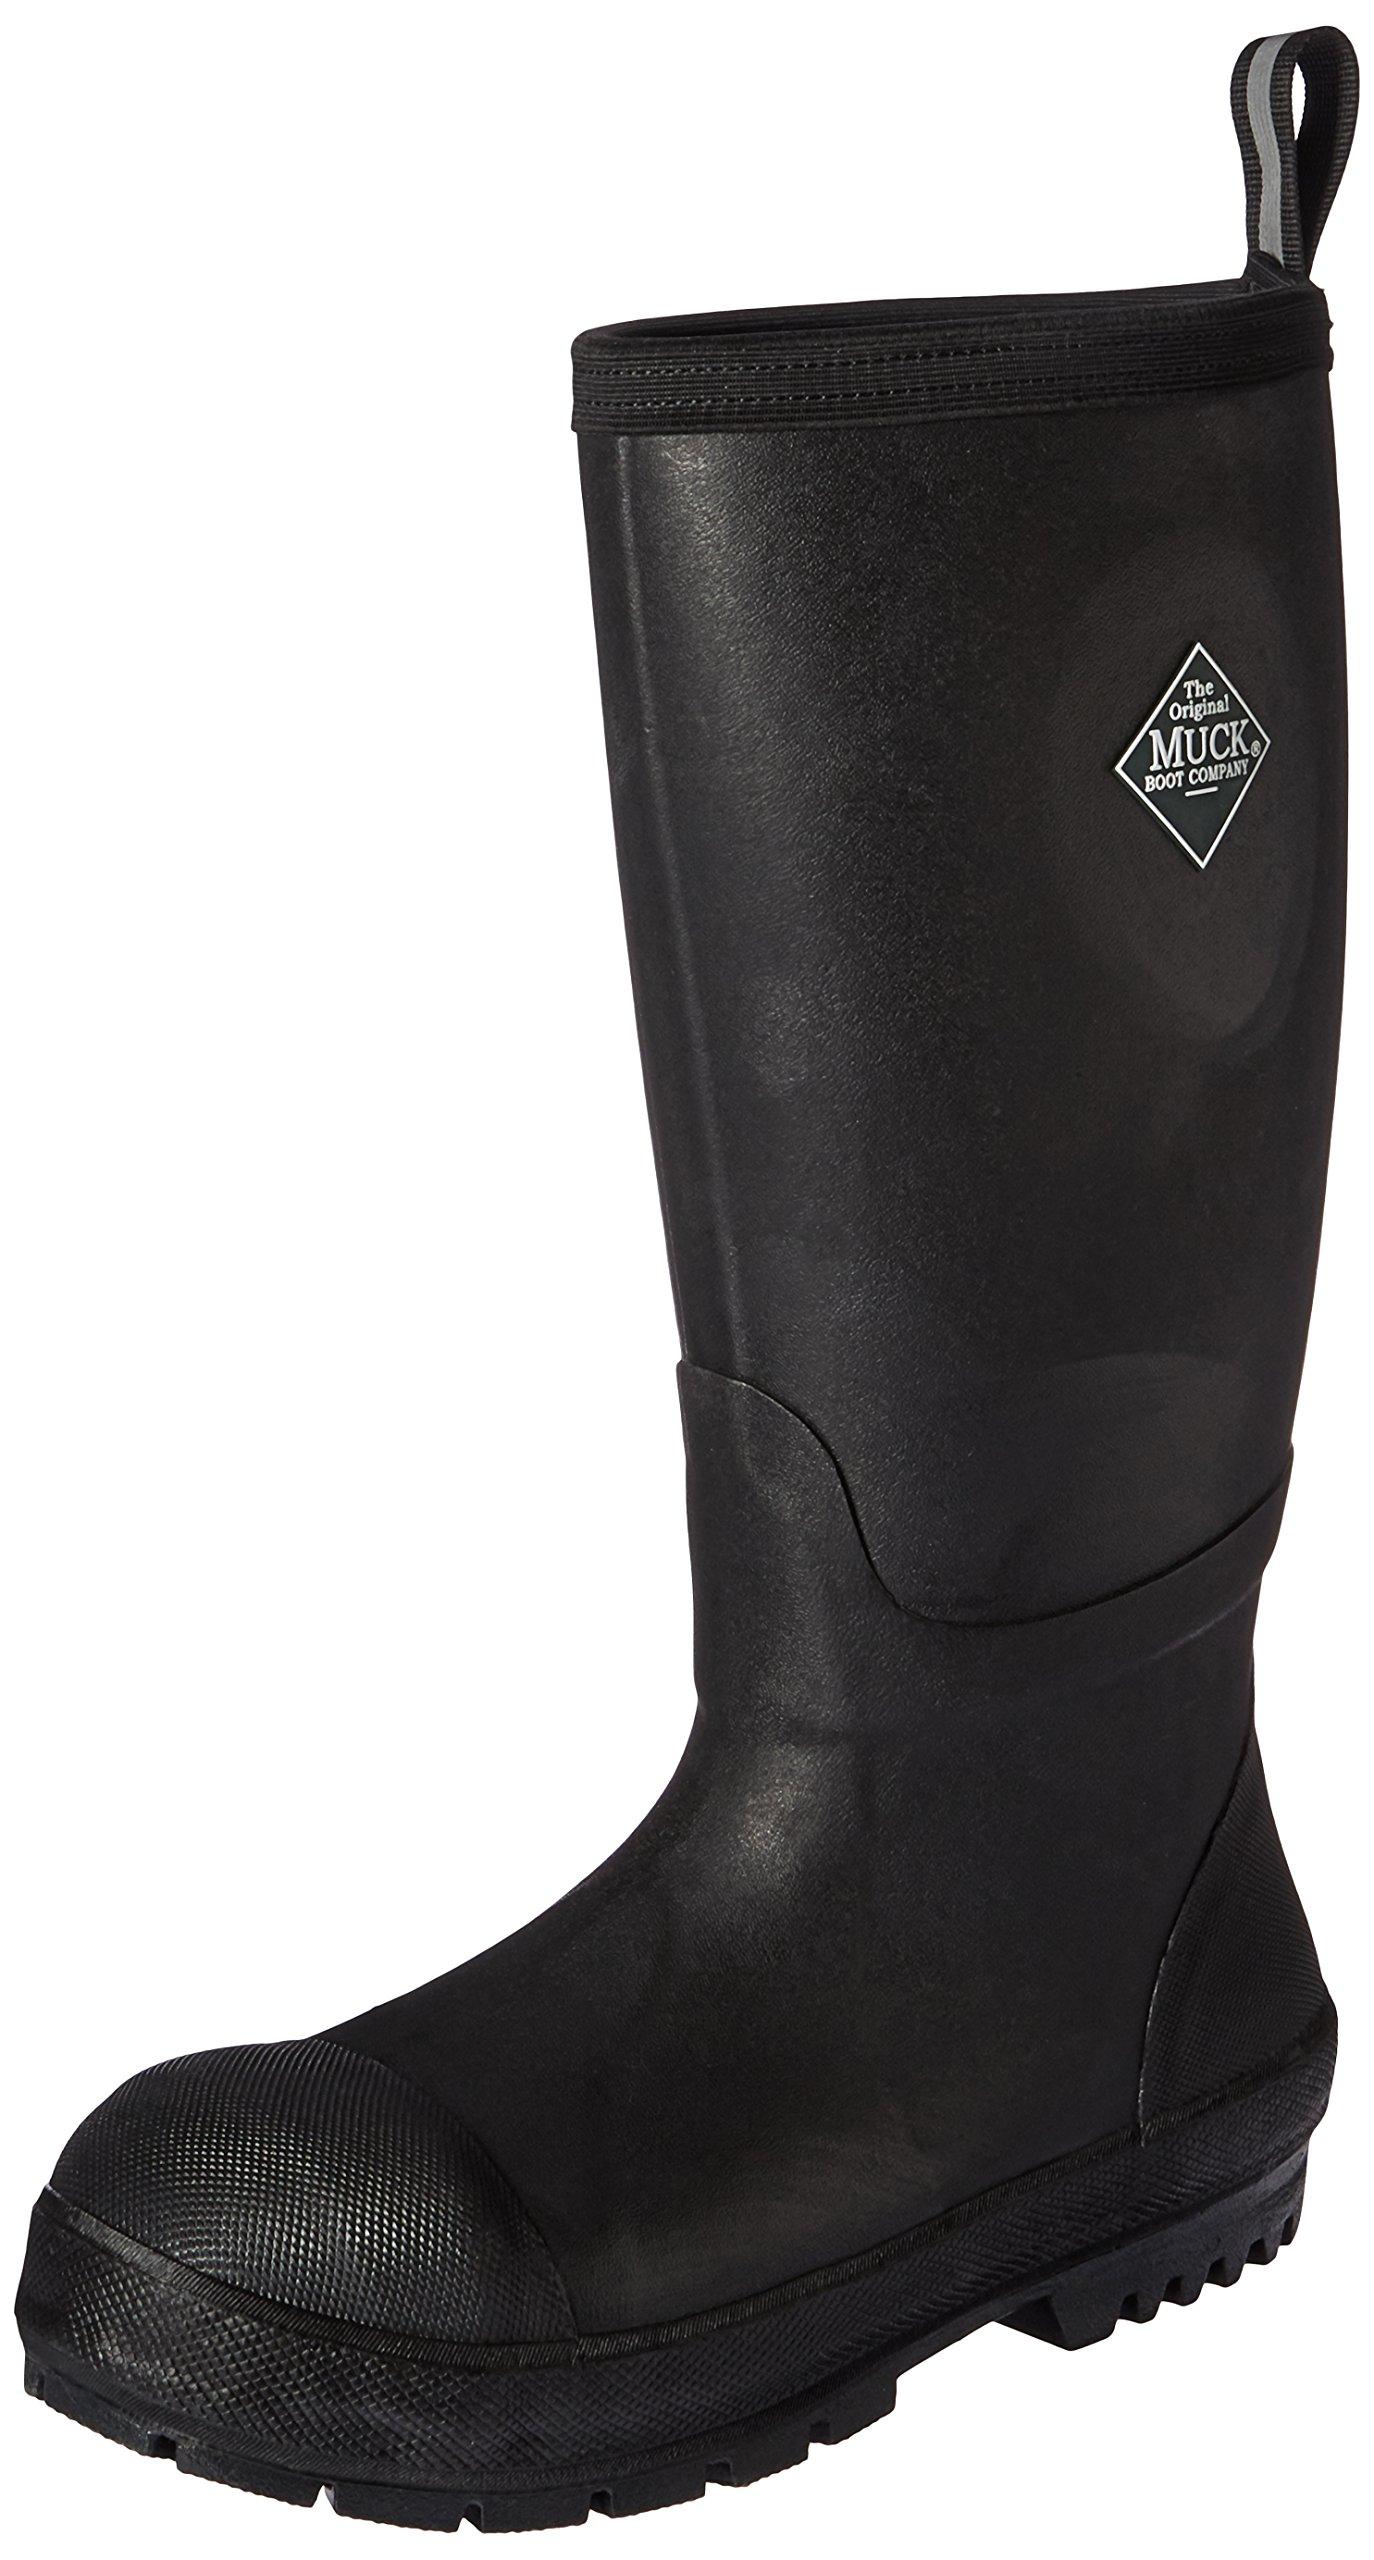 Muck Boot Men's Chore Resistant Tall Steel Toe Work Boot, Black, 10 US/10-10.5 M US